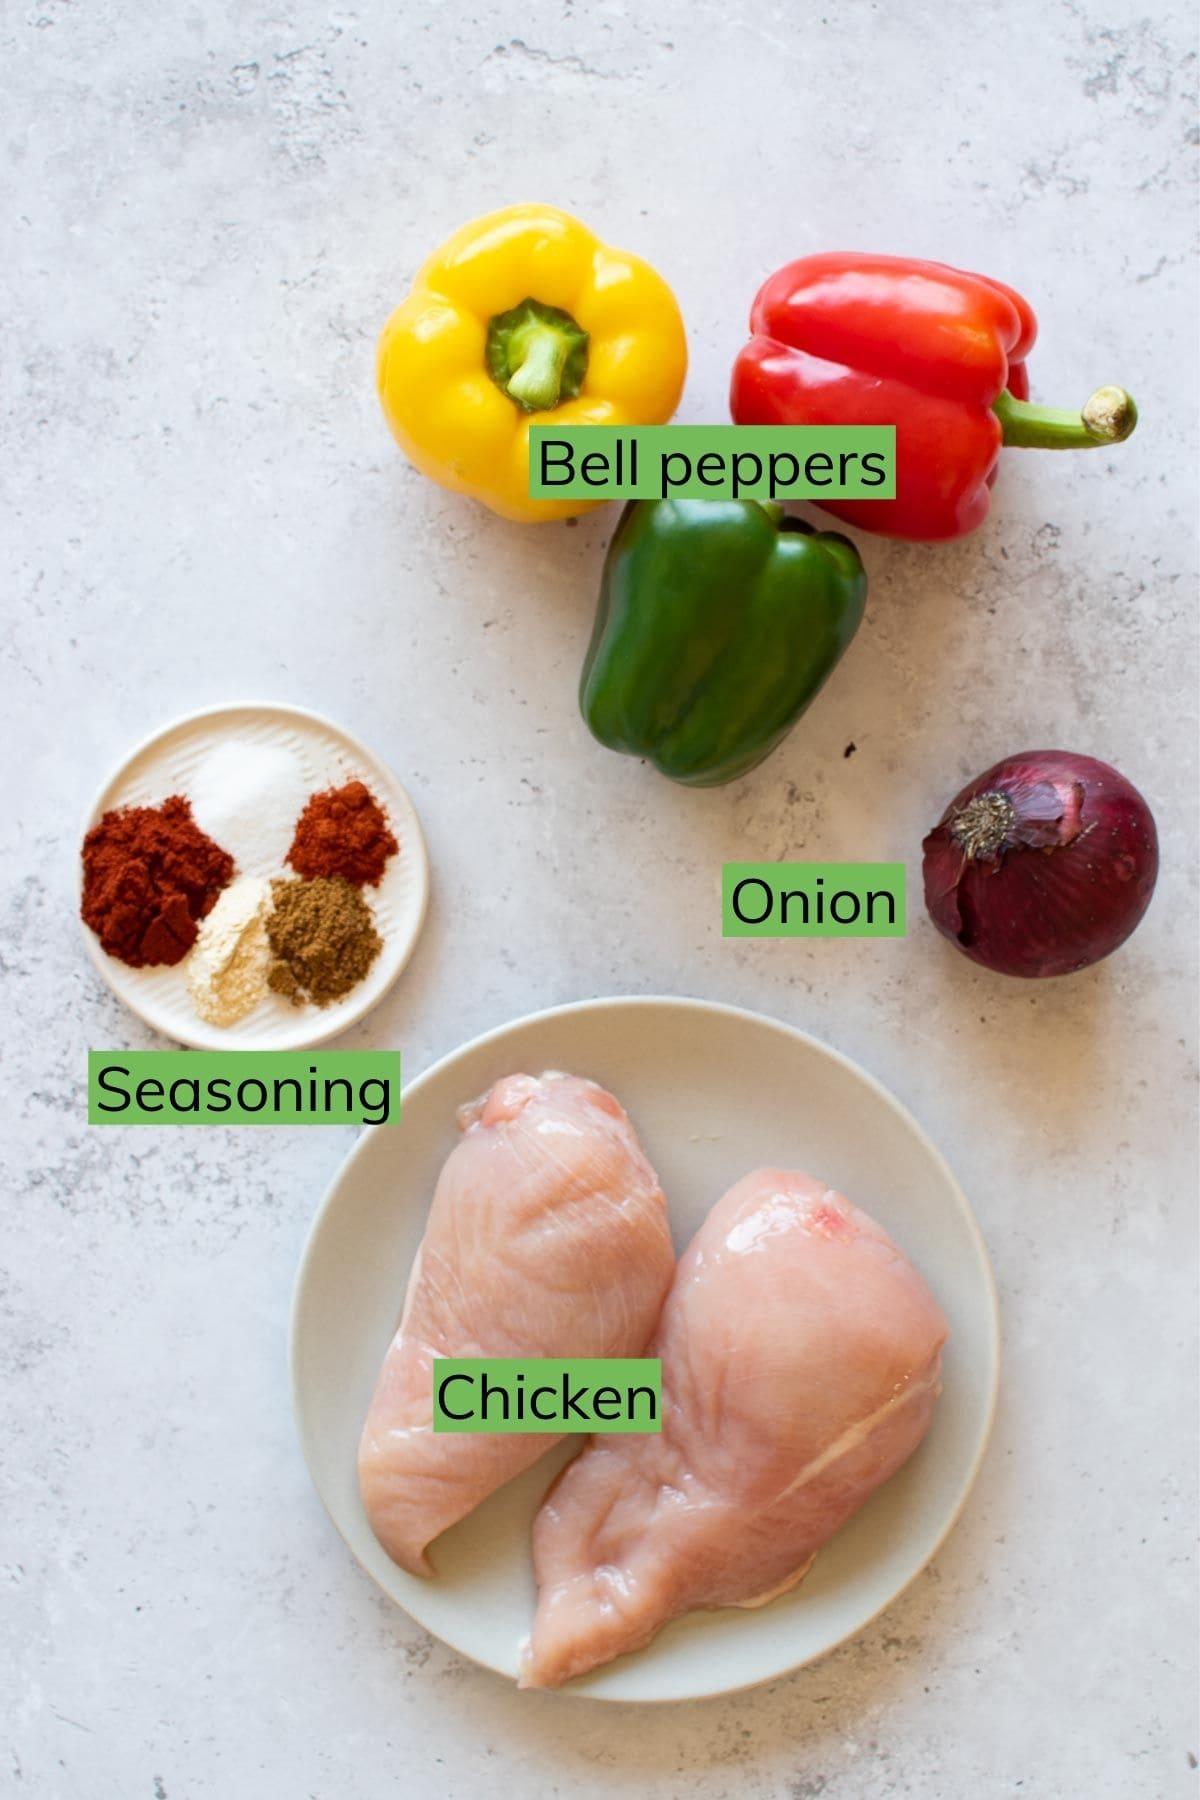 Ingredients for fajitas.